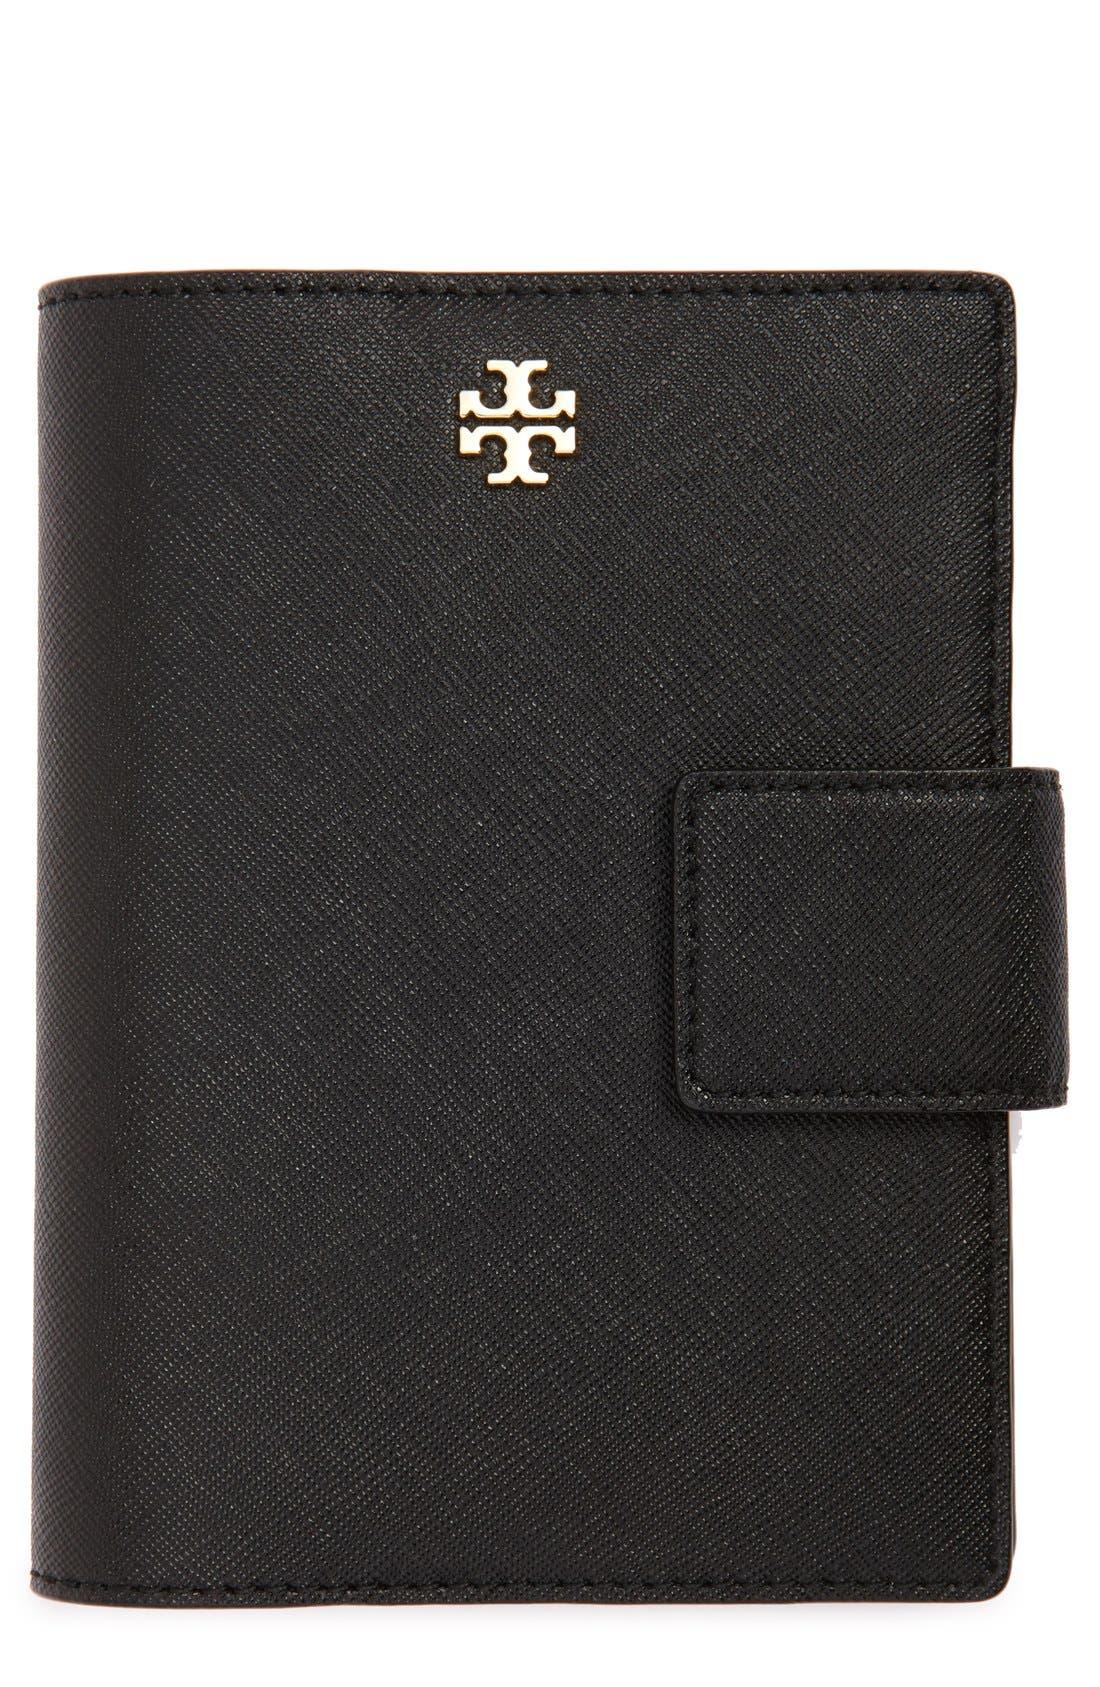 'Robinson' Passport Holder,                             Main thumbnail 1, color,                             001